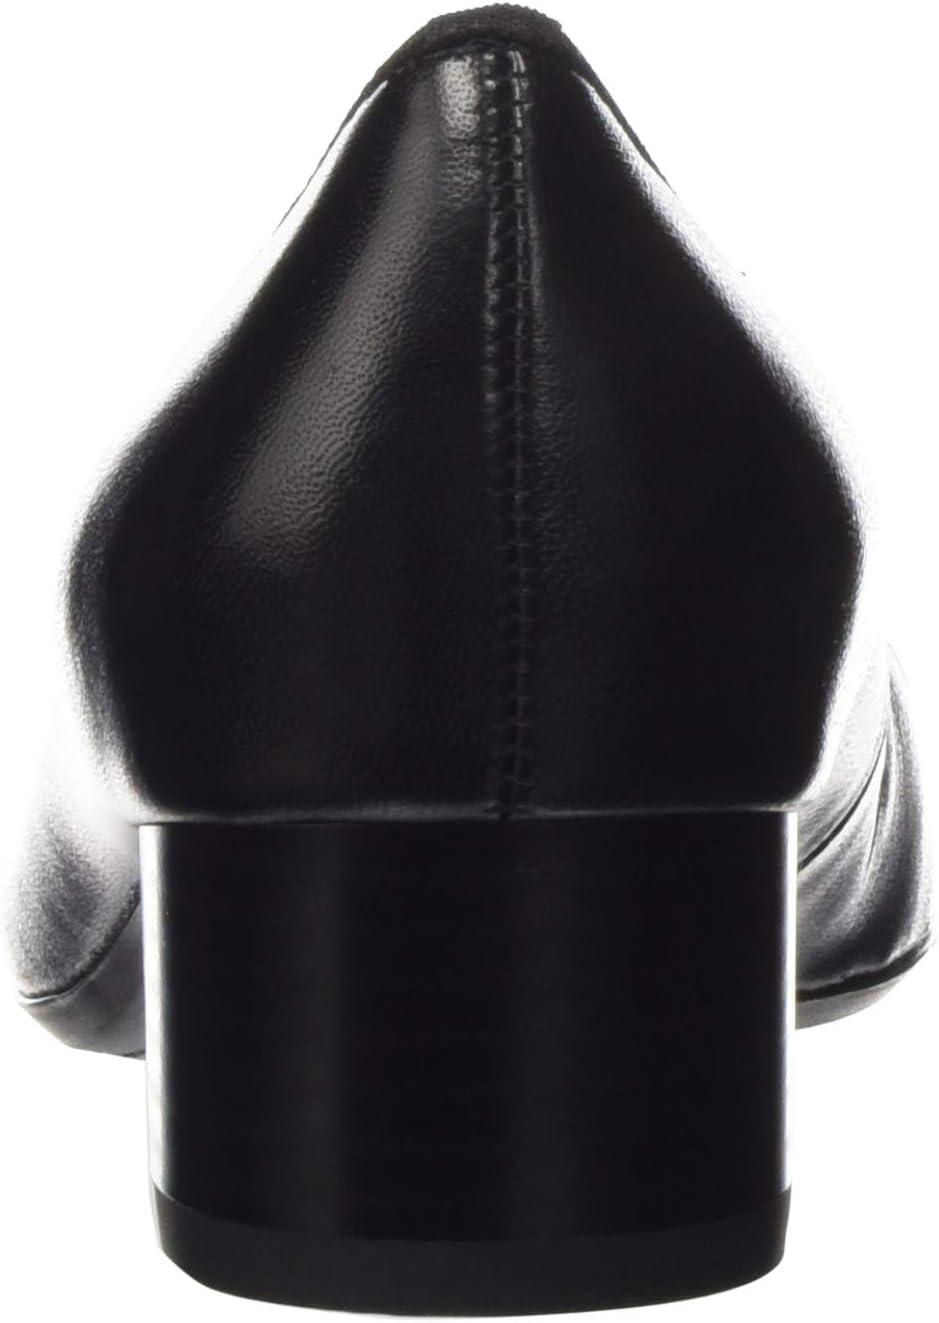 ARA Vicenza Dames Pumps zwart